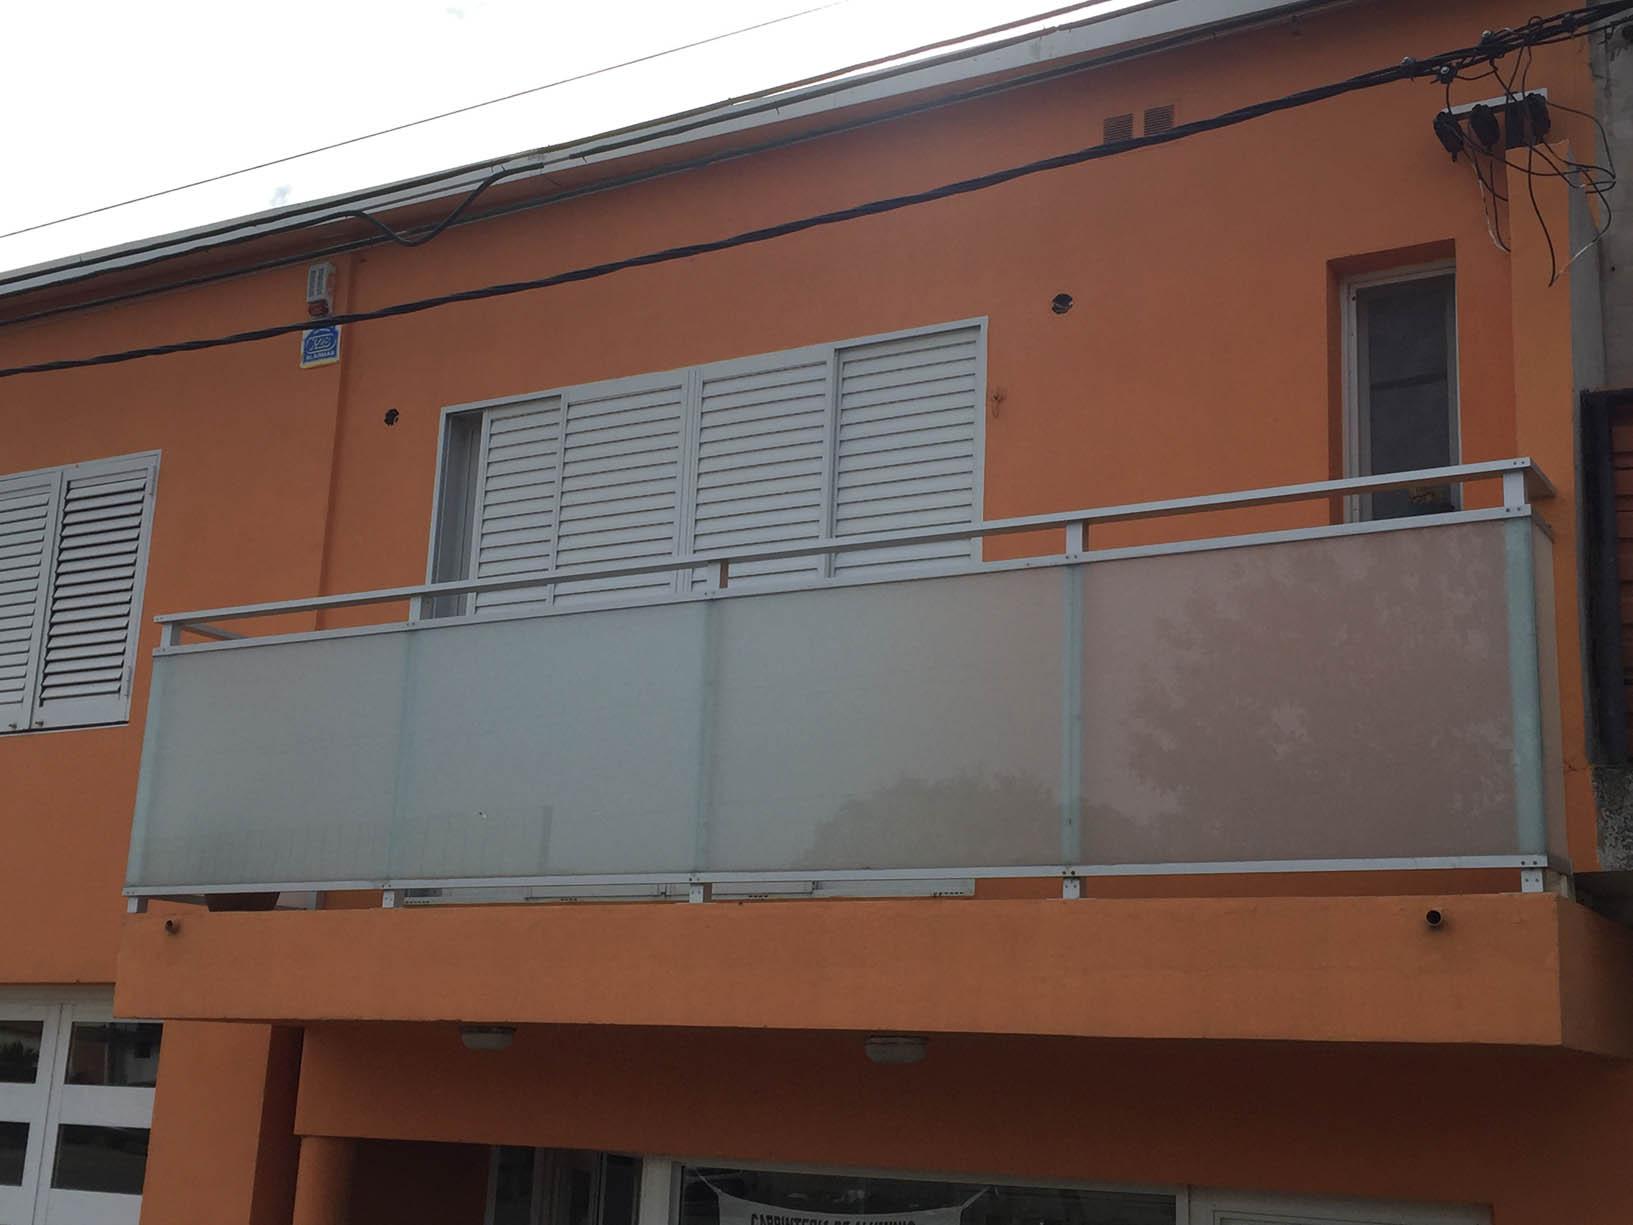 Cerramiento De Balcon De Aluminio Con Cristal 33 Blisan Esmerilado - Balcones-aluminio